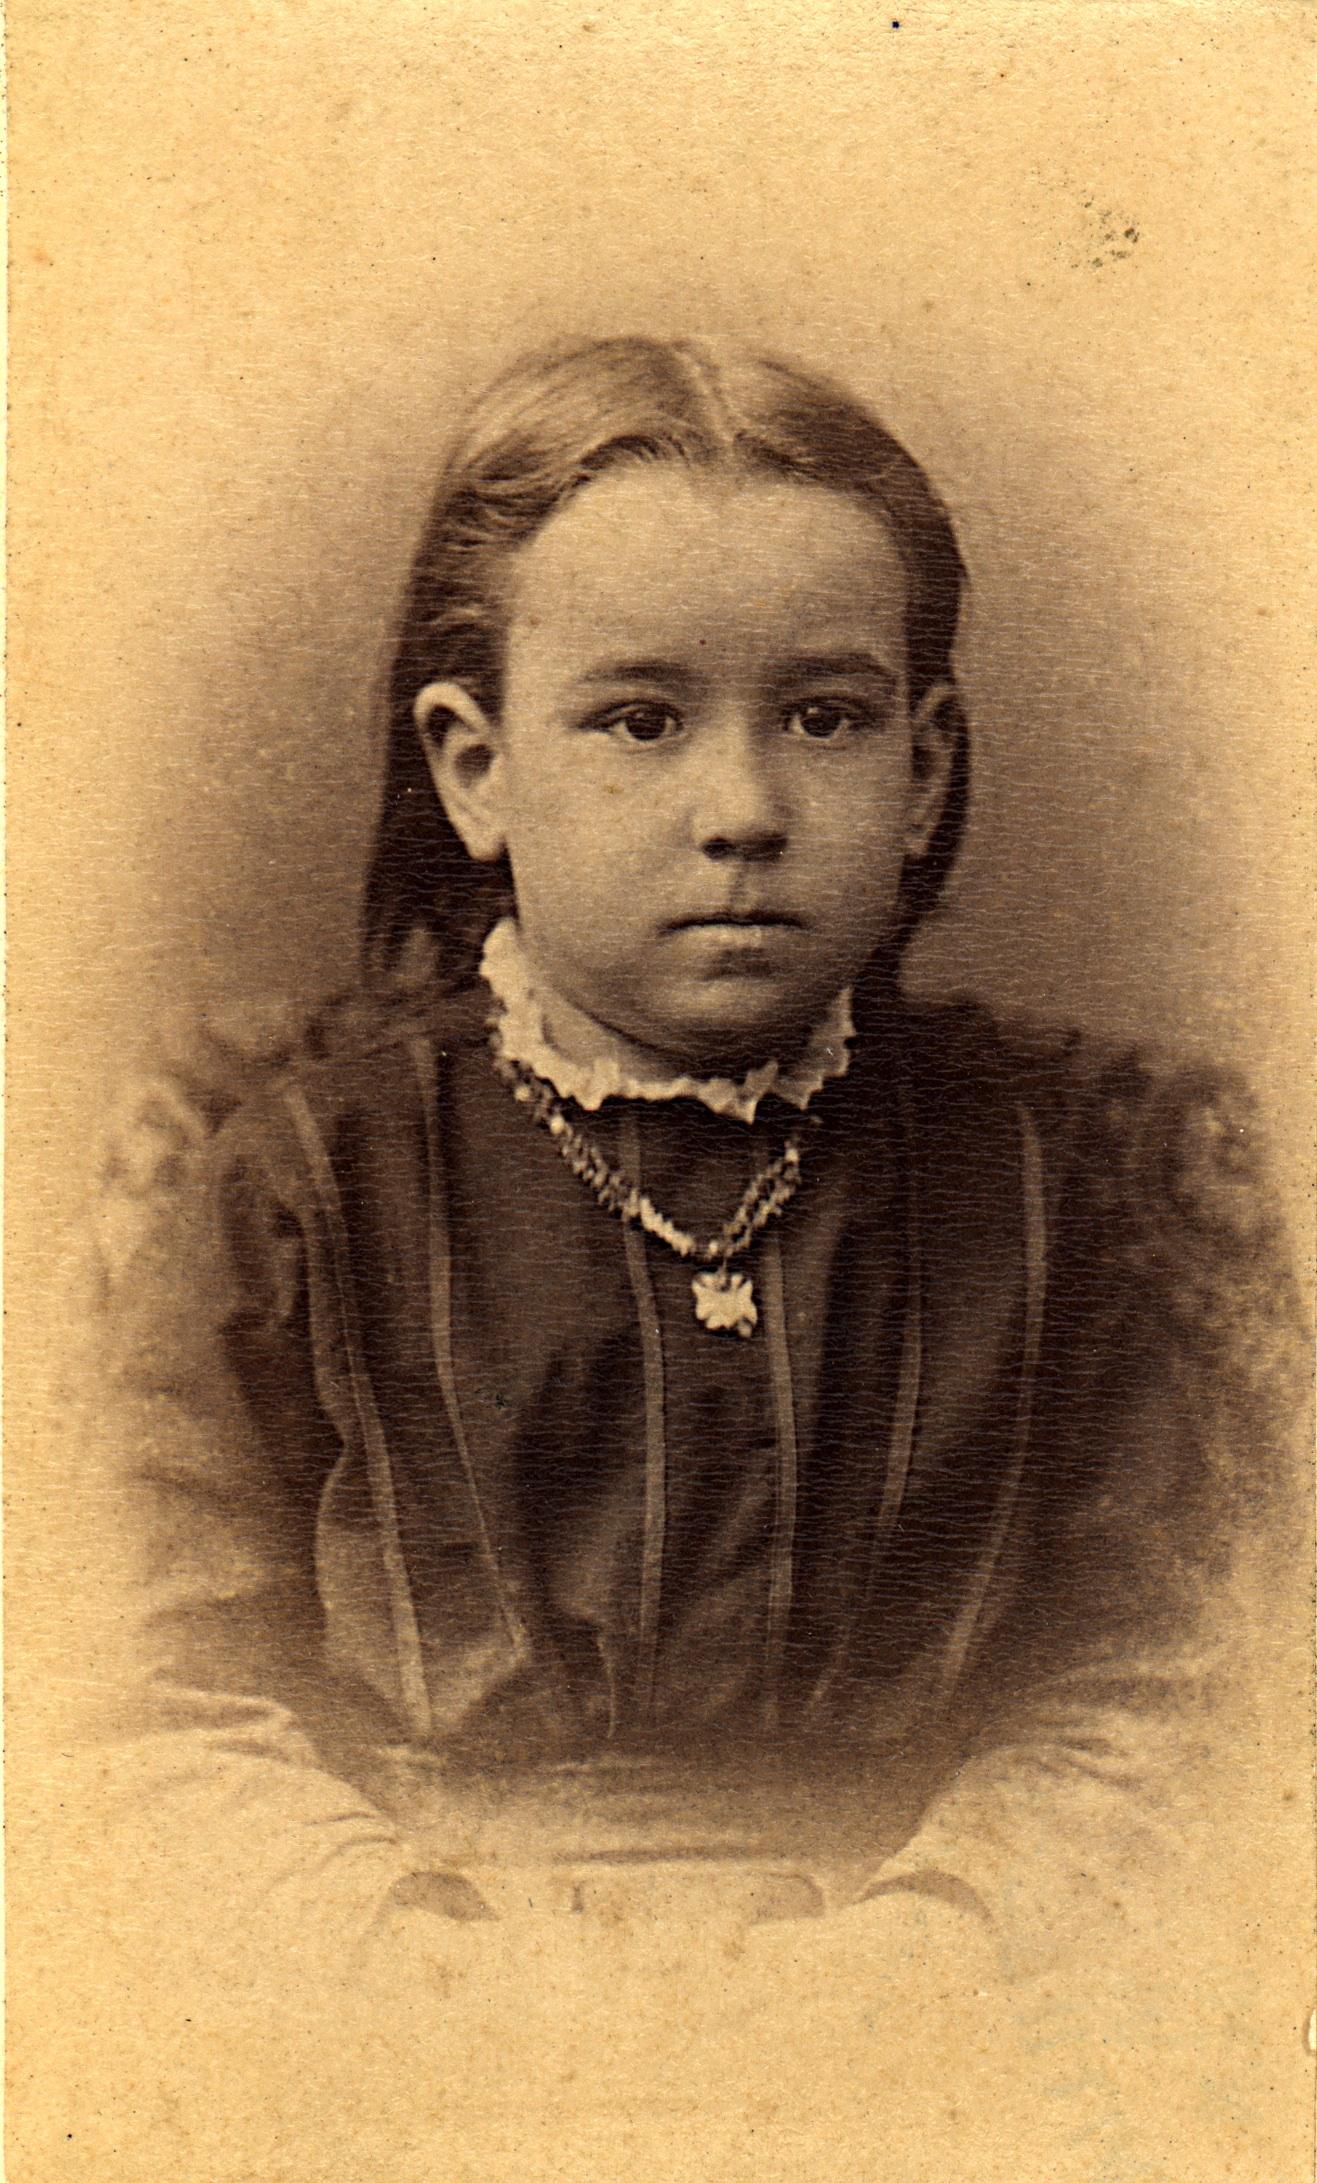 Nettie Cornell